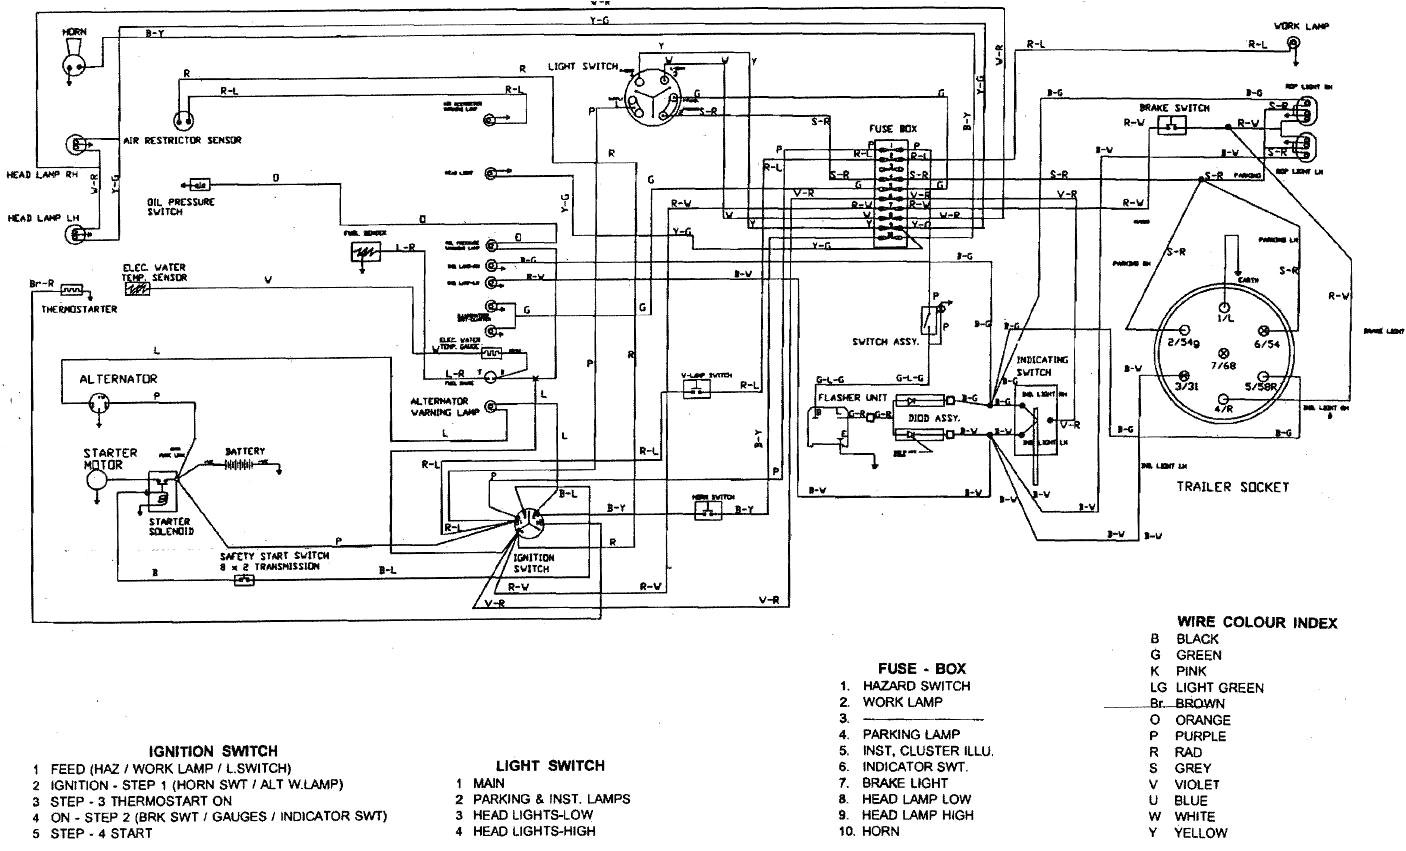 john deere l111 lawn tractor wiring diagram of wiring diagram rows john deere l111 parts diagram